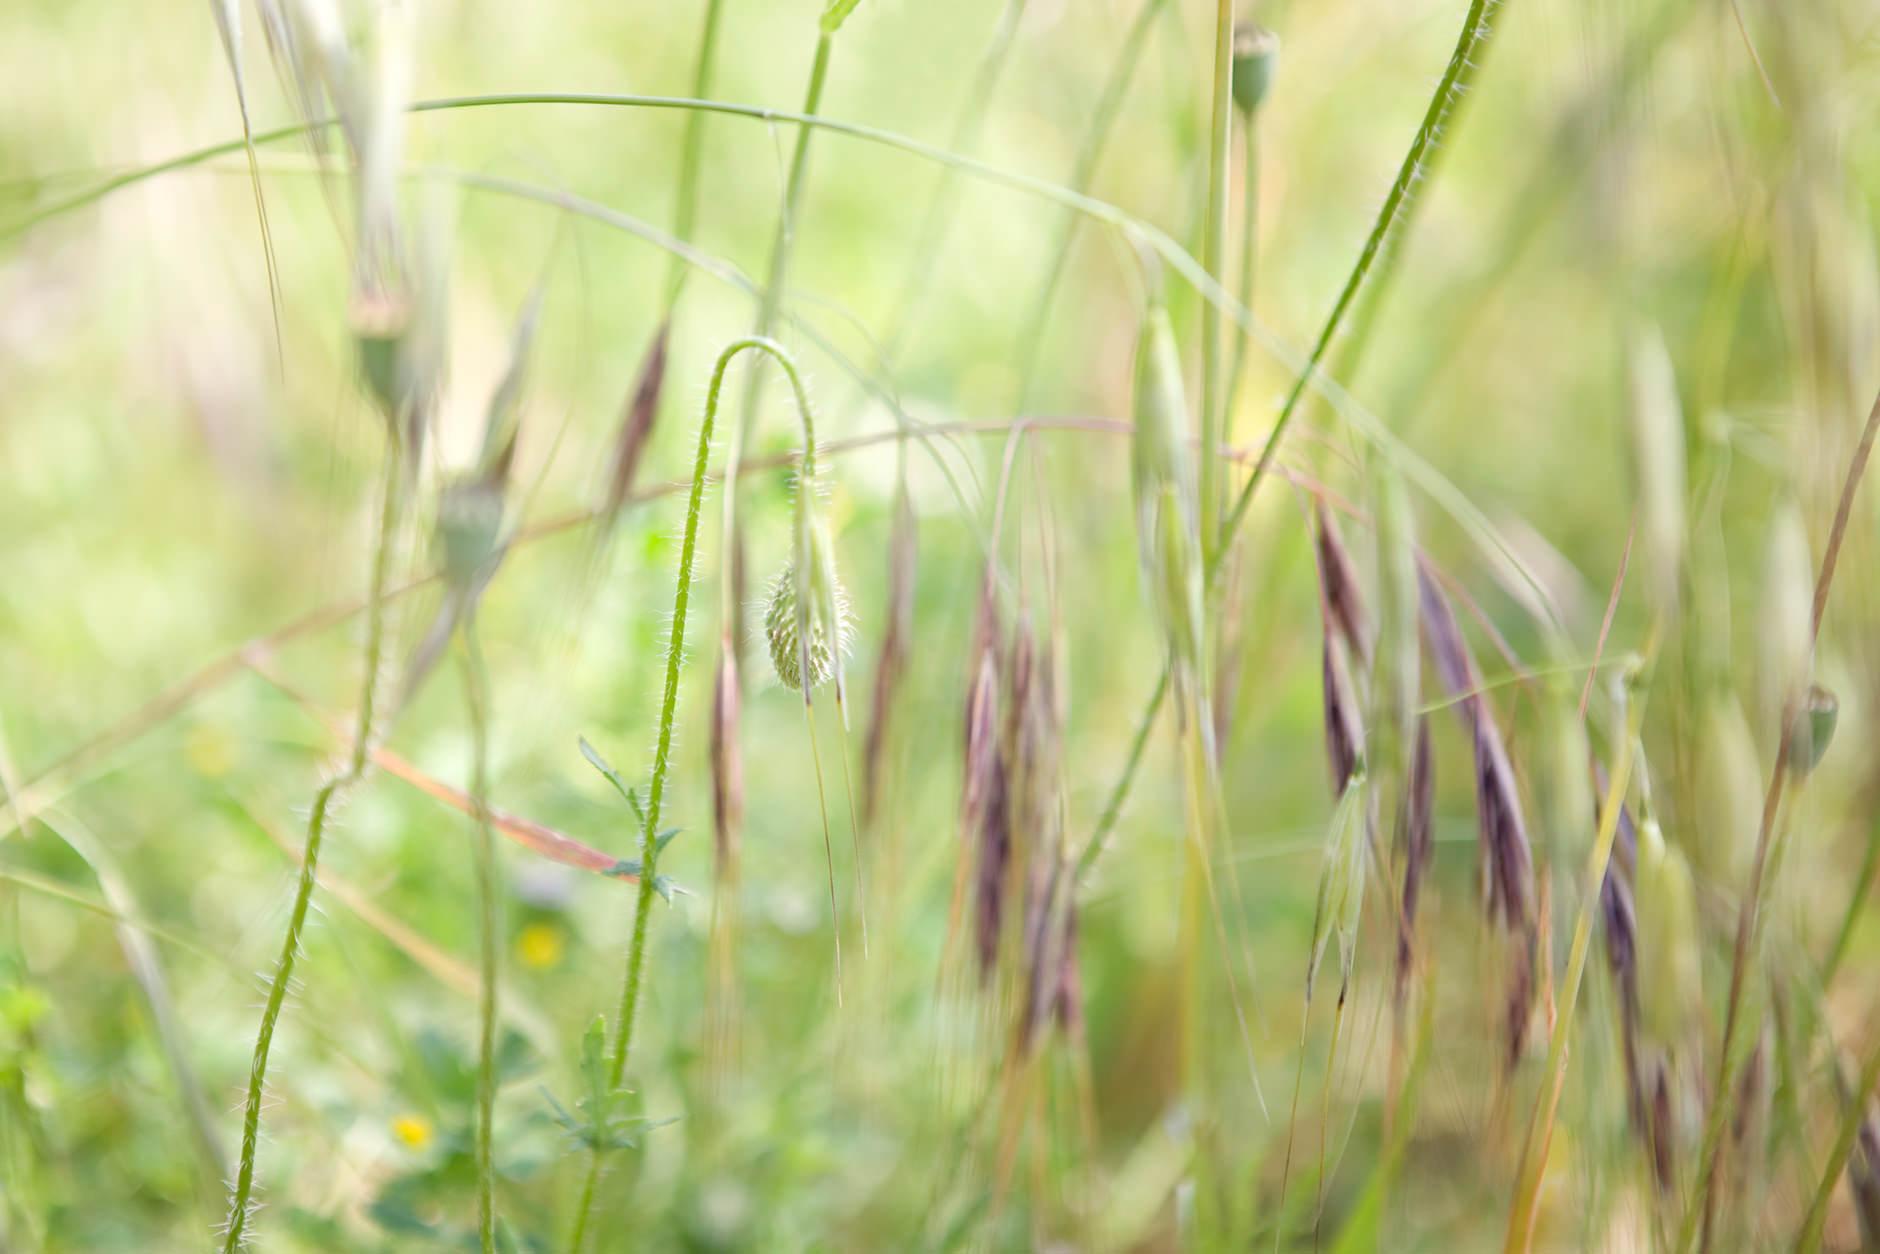 Michelle Grant | Stillness | Untitled